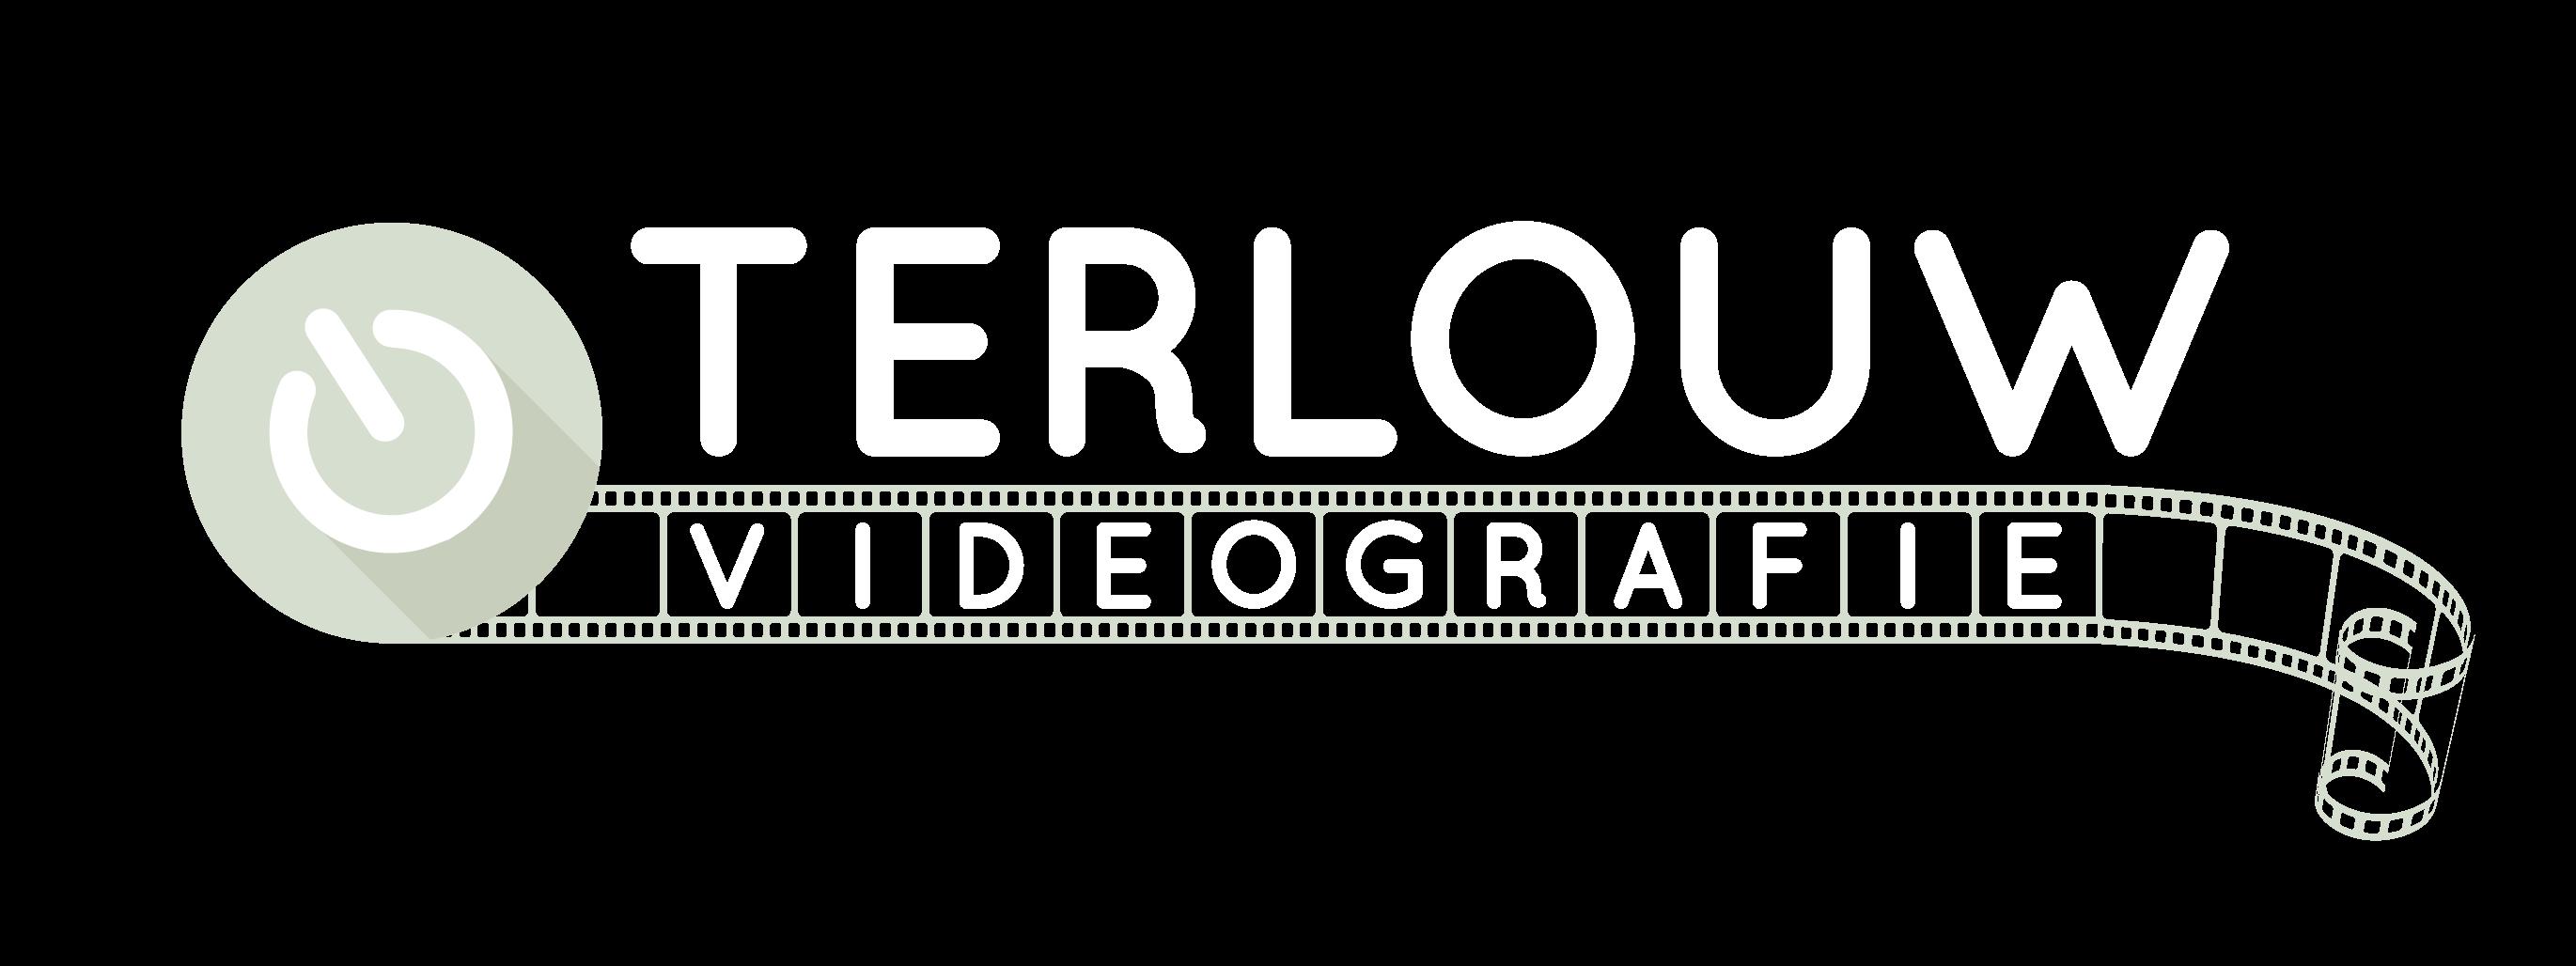 Terlouw Videografie